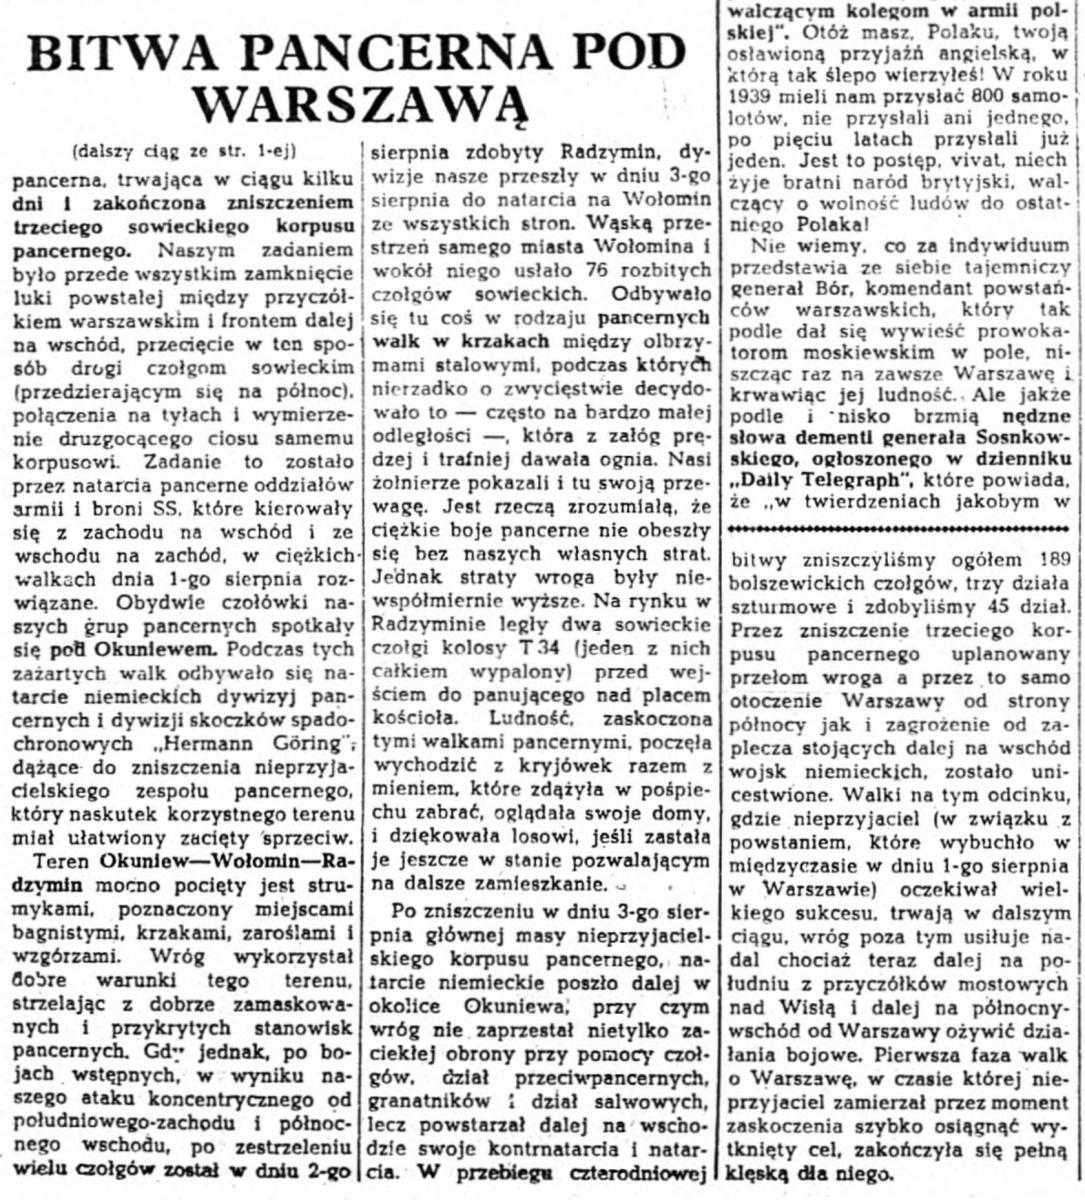 Gazeta Ilustrowana. R.5, nr 35 (27 sierpnia 1944) nr 243 b